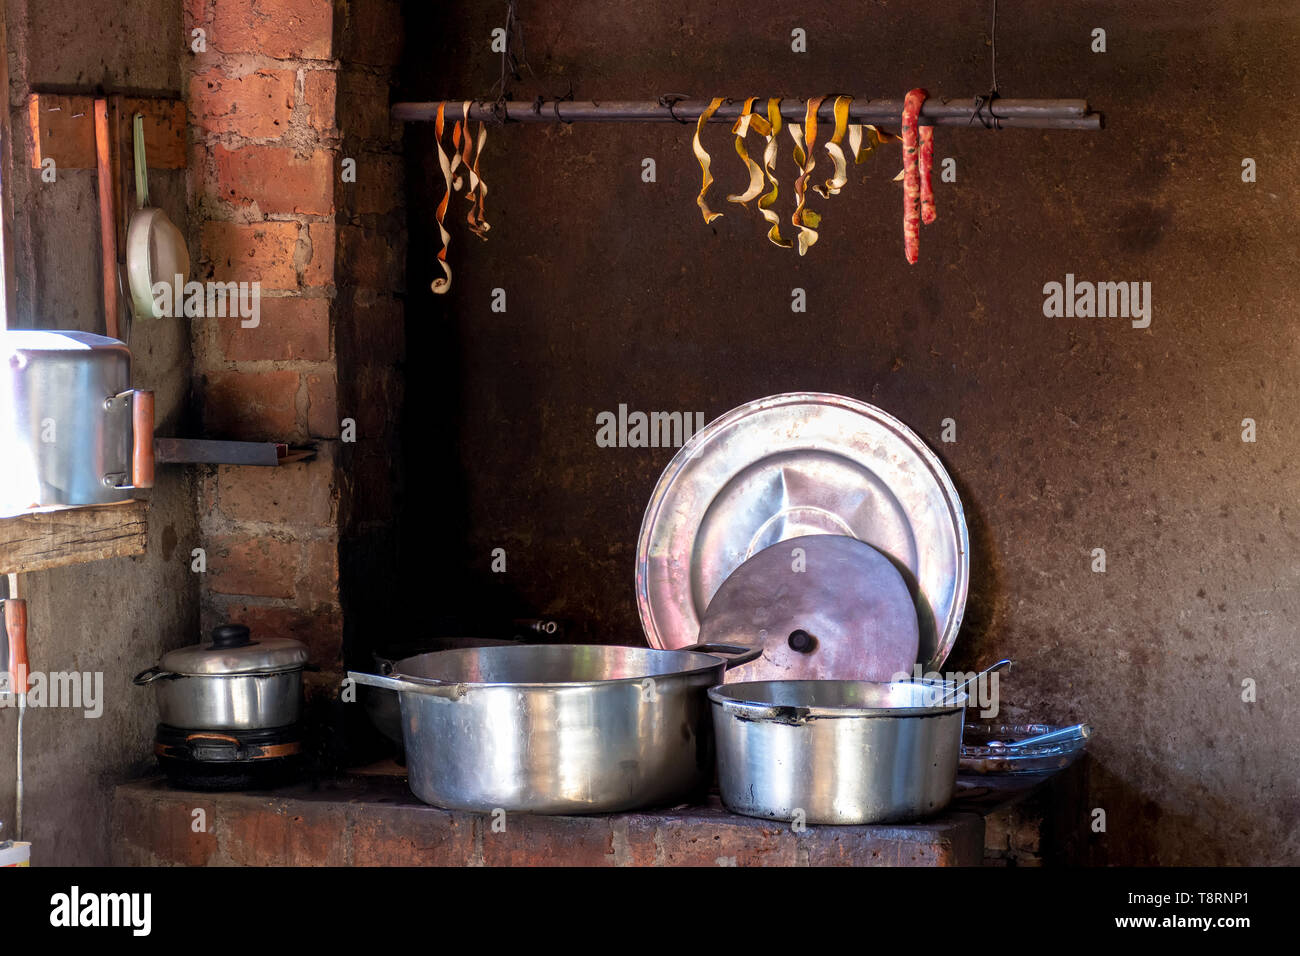 Old popular brazilian kitchen and utensil - Stock Image